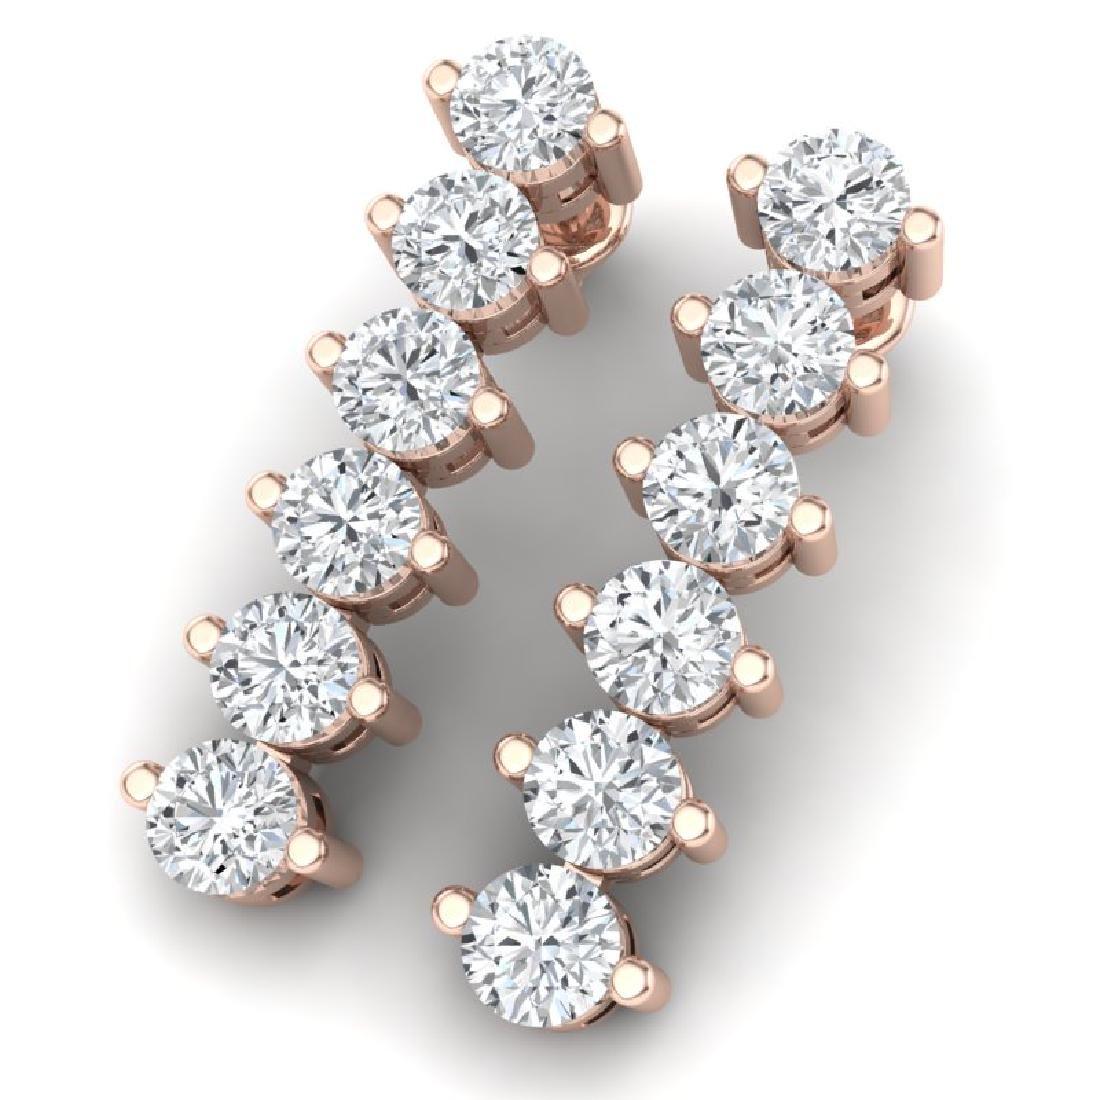 3 CTW Certified VS/SI Diamond Earrings 18K Rose Gold